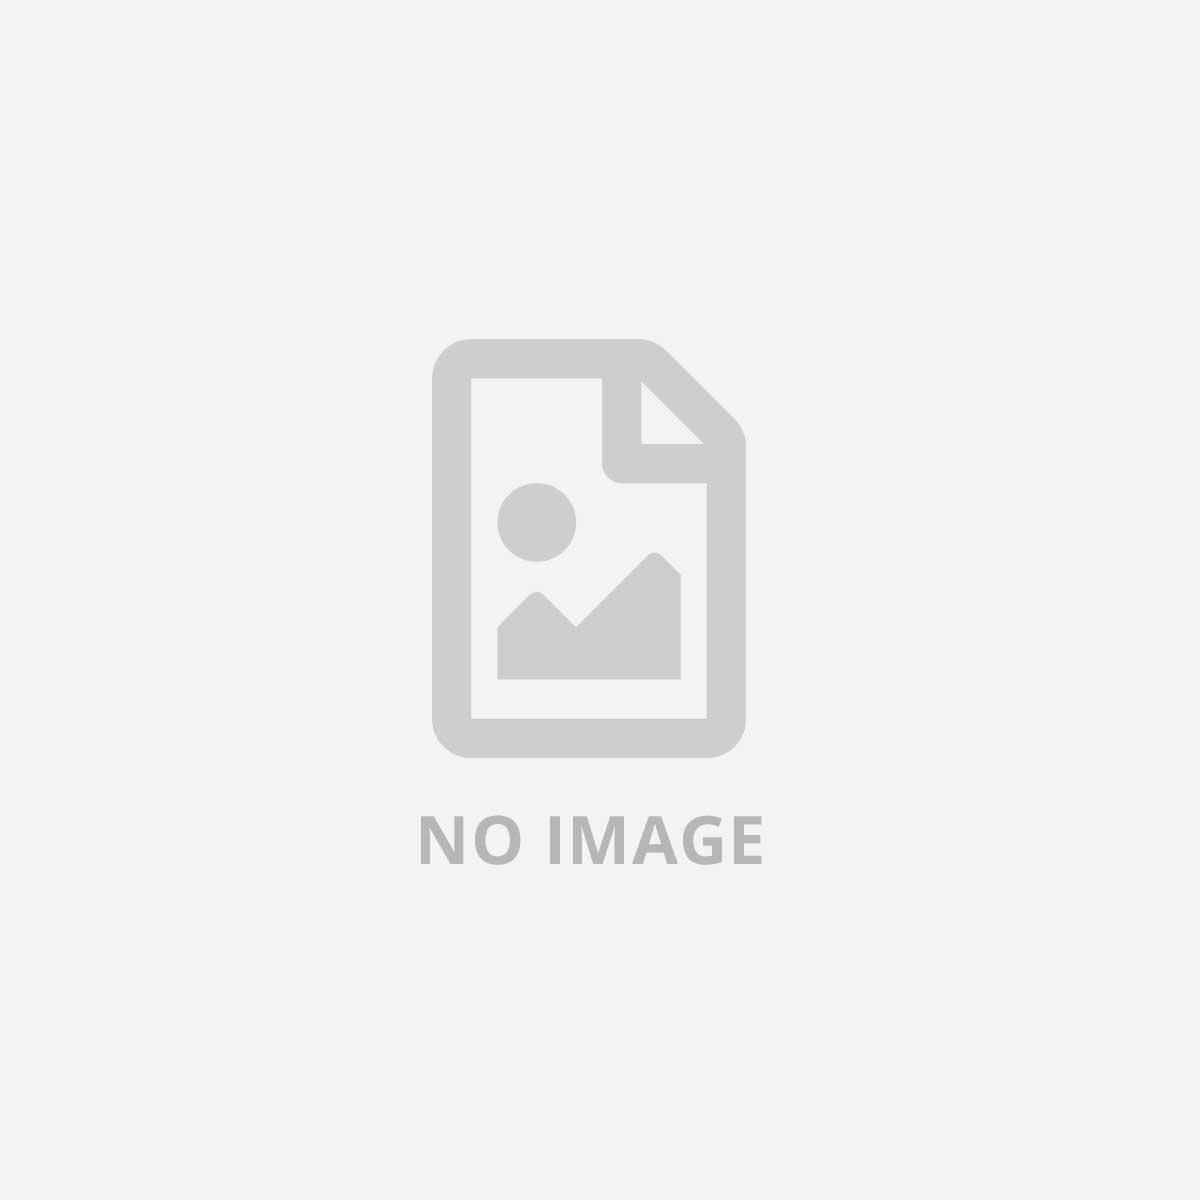 XYZ PRINTING 3D PEN 1.0 EDUCATION PACKAGE